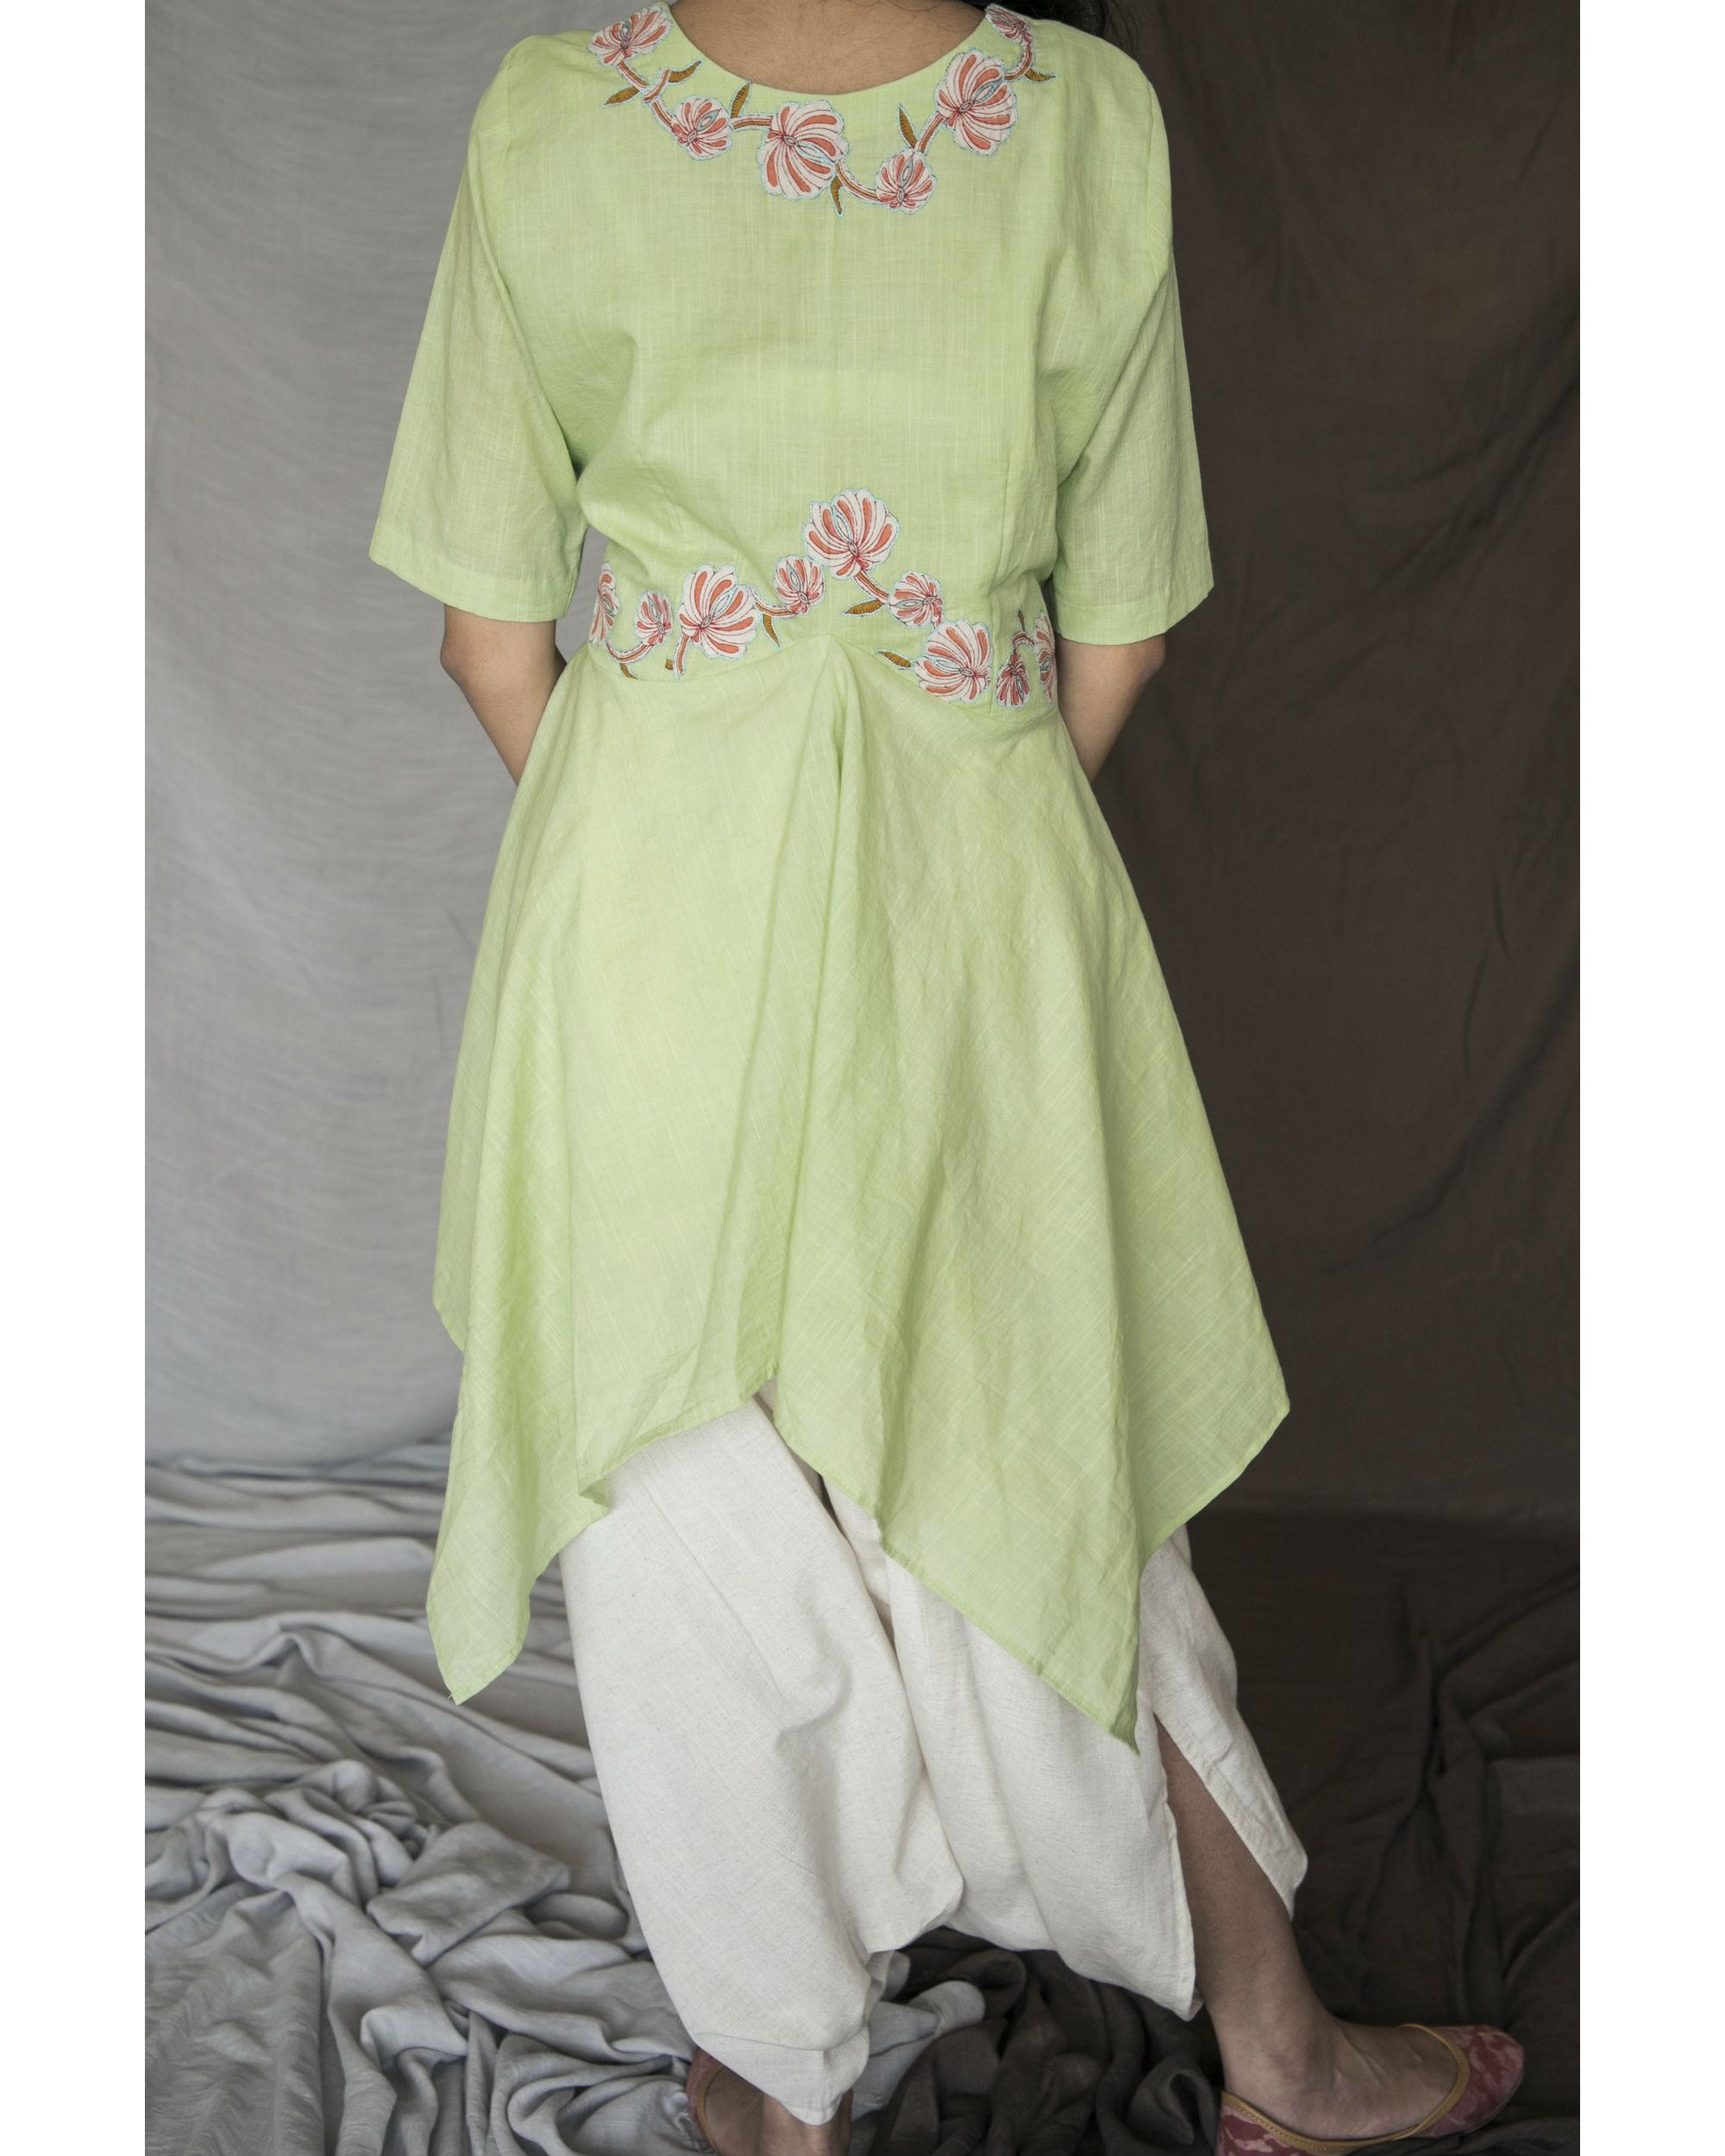 aebafaf03c6 Parrot green handkerchief kurta with dhoti pants by Bari